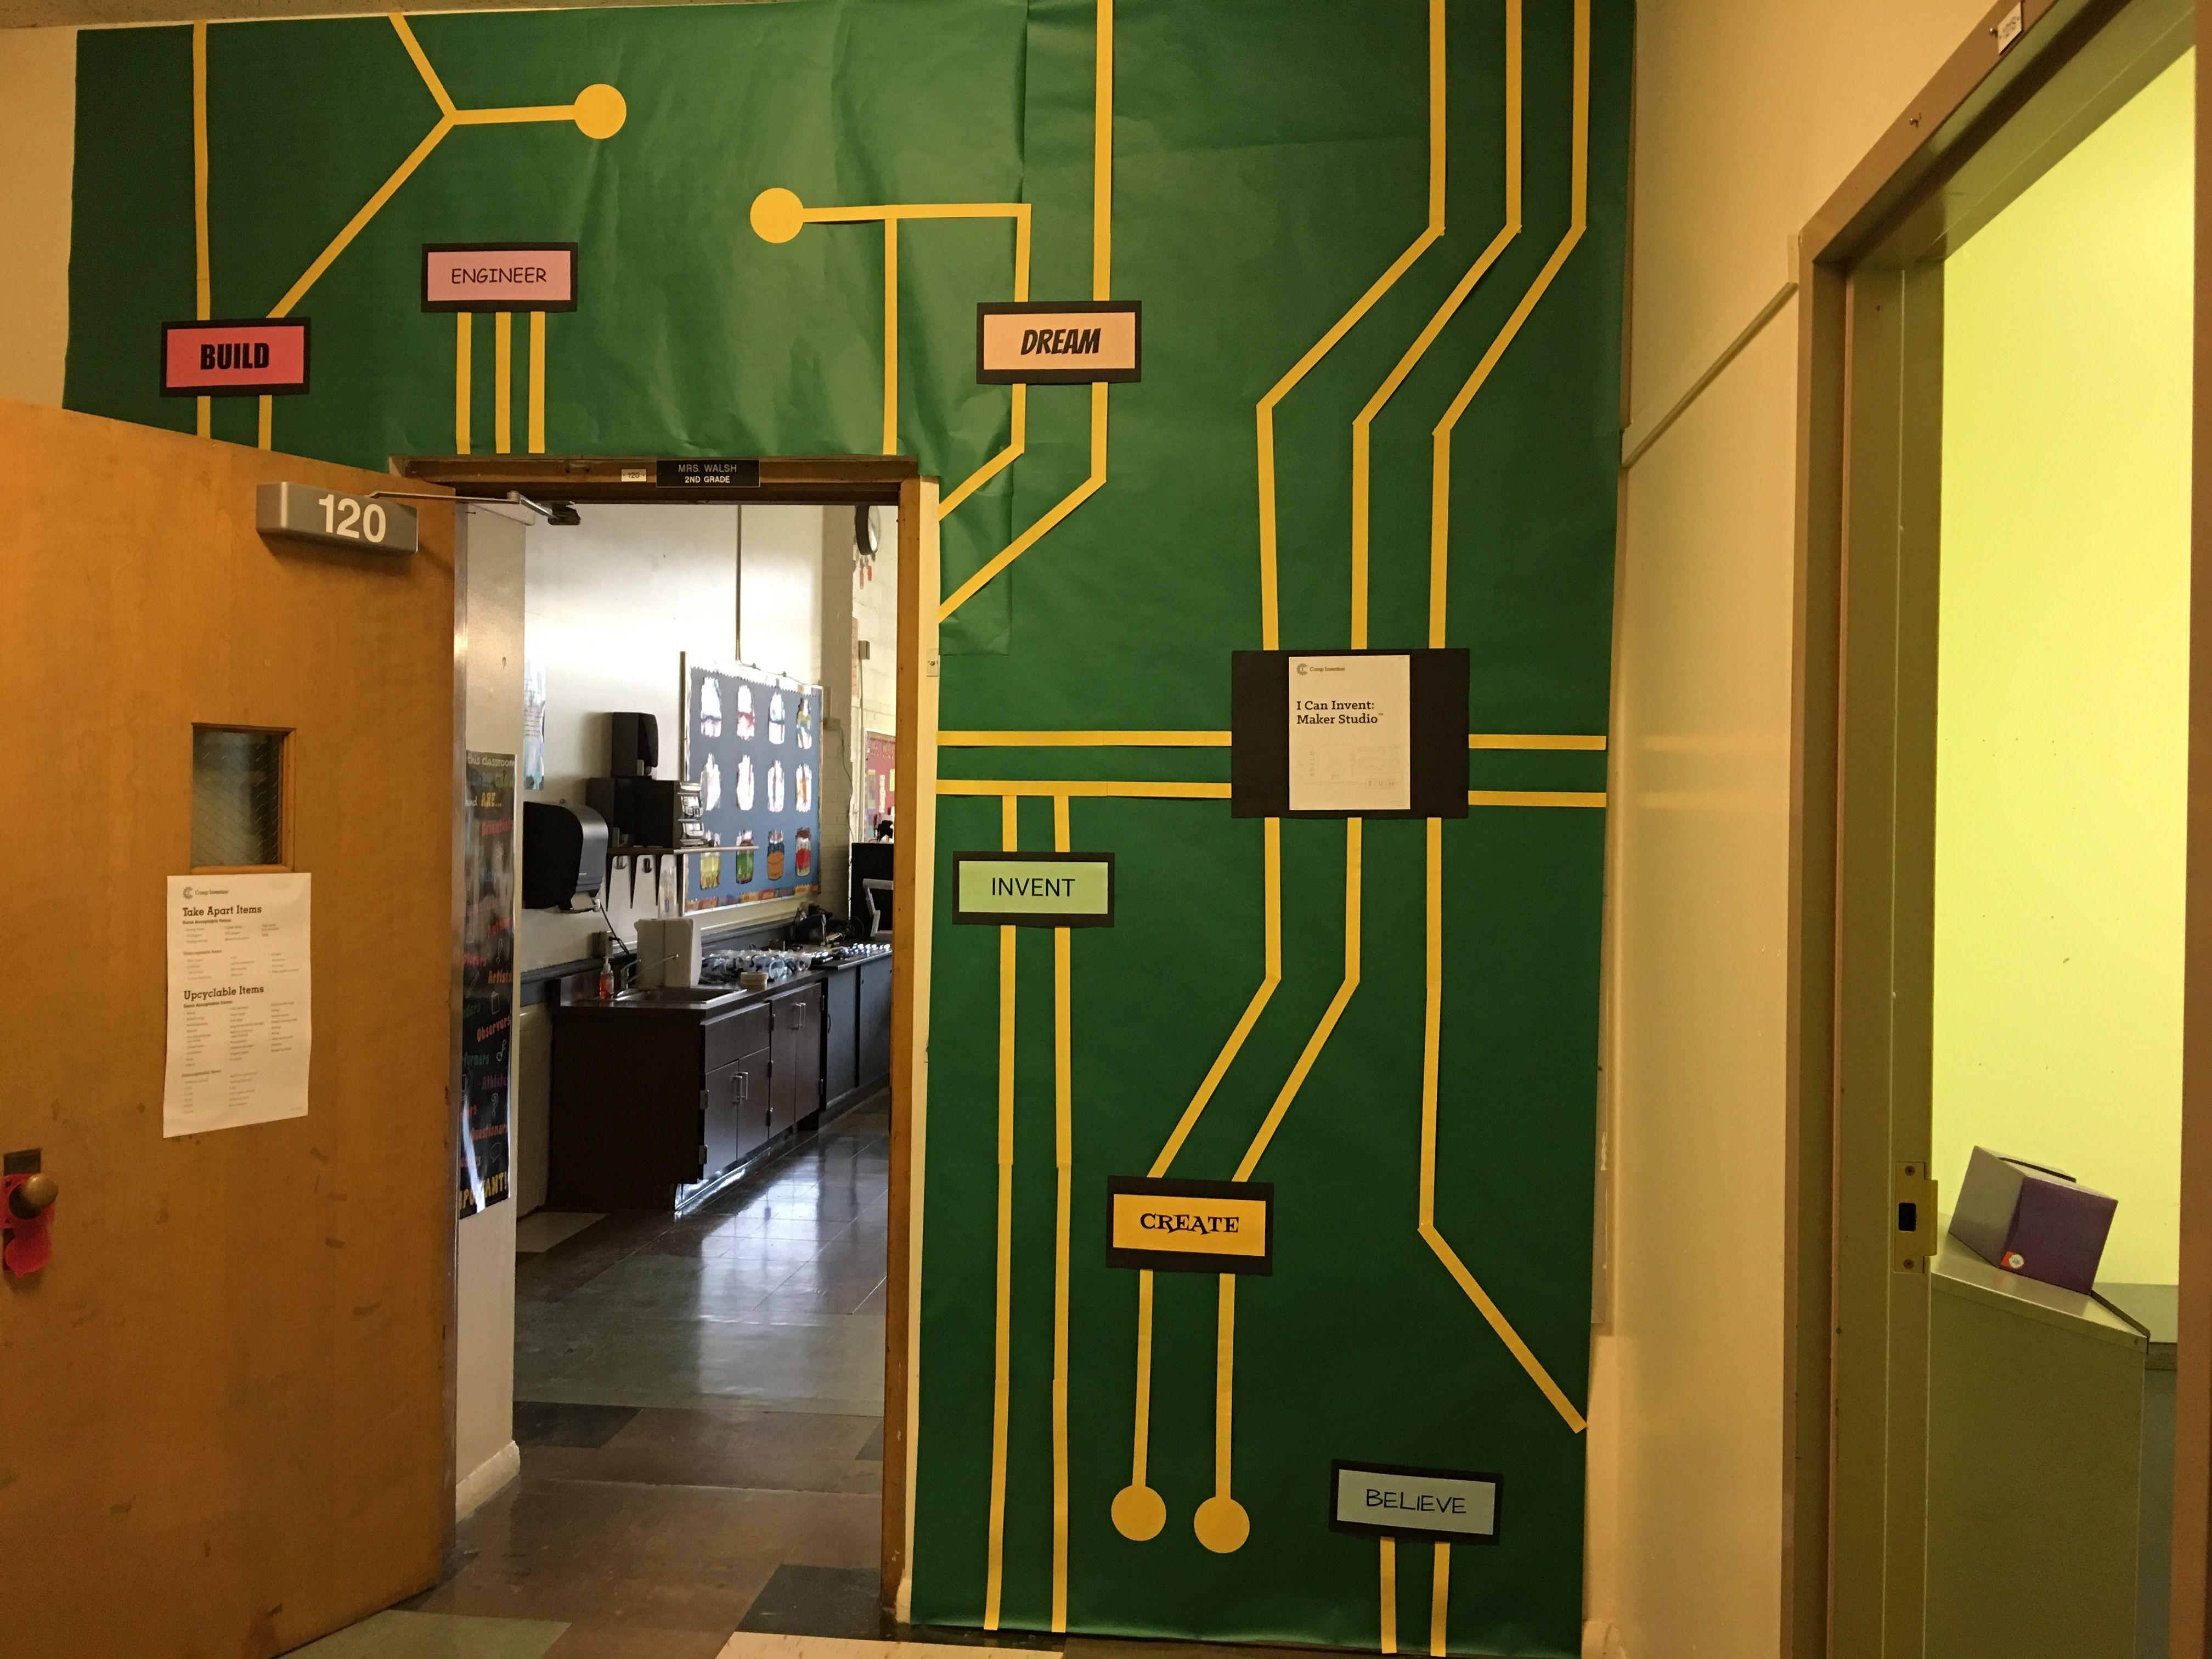 Classroom Decoration Camp Invention Stem 2016